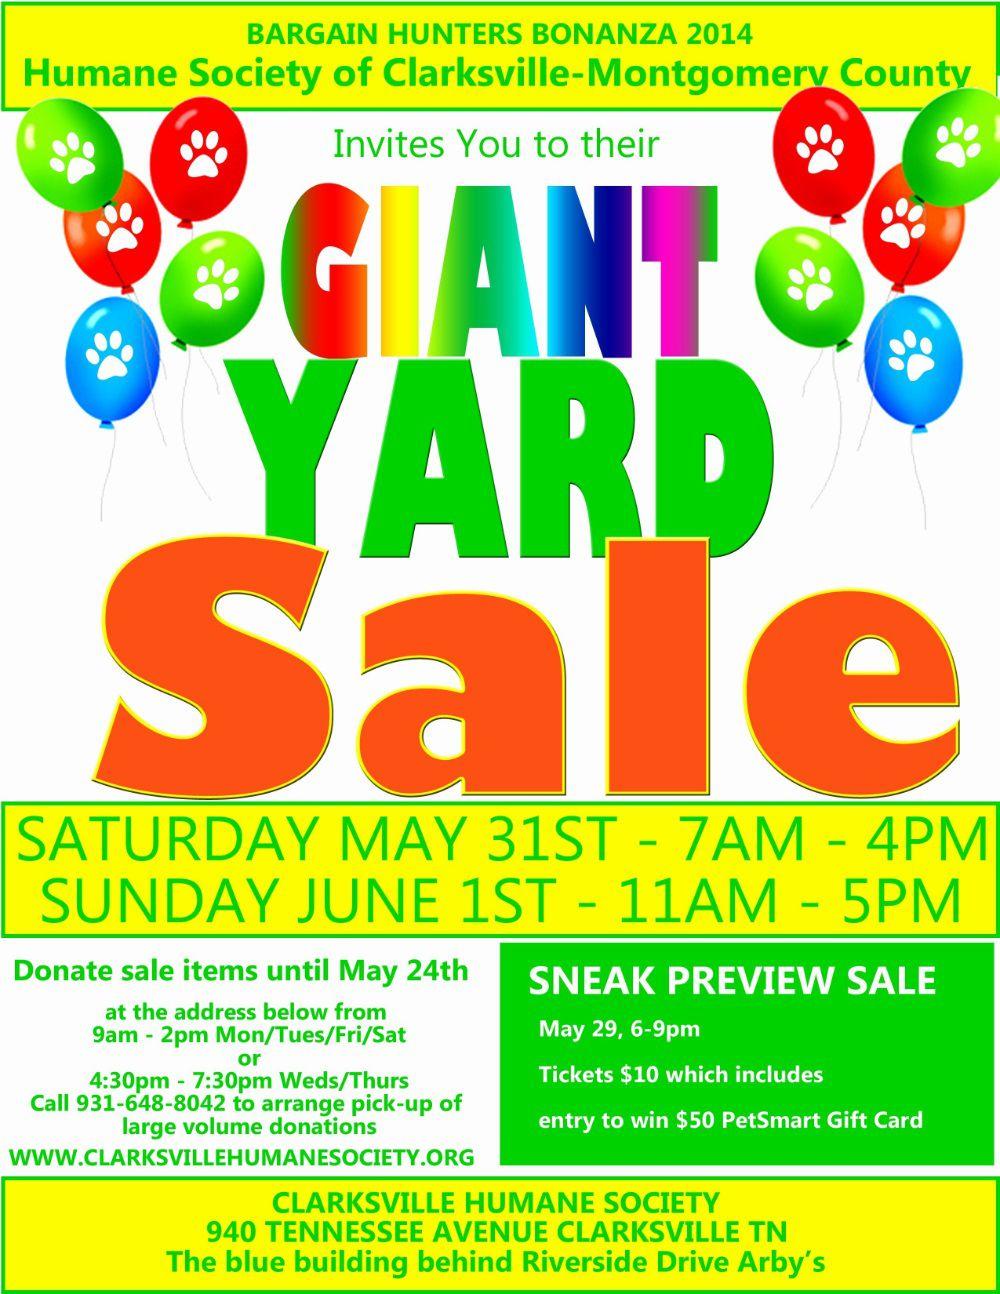 007 Outstanding Garage Sale Flyer Template Free Sample  Community Neighborhood YardFull